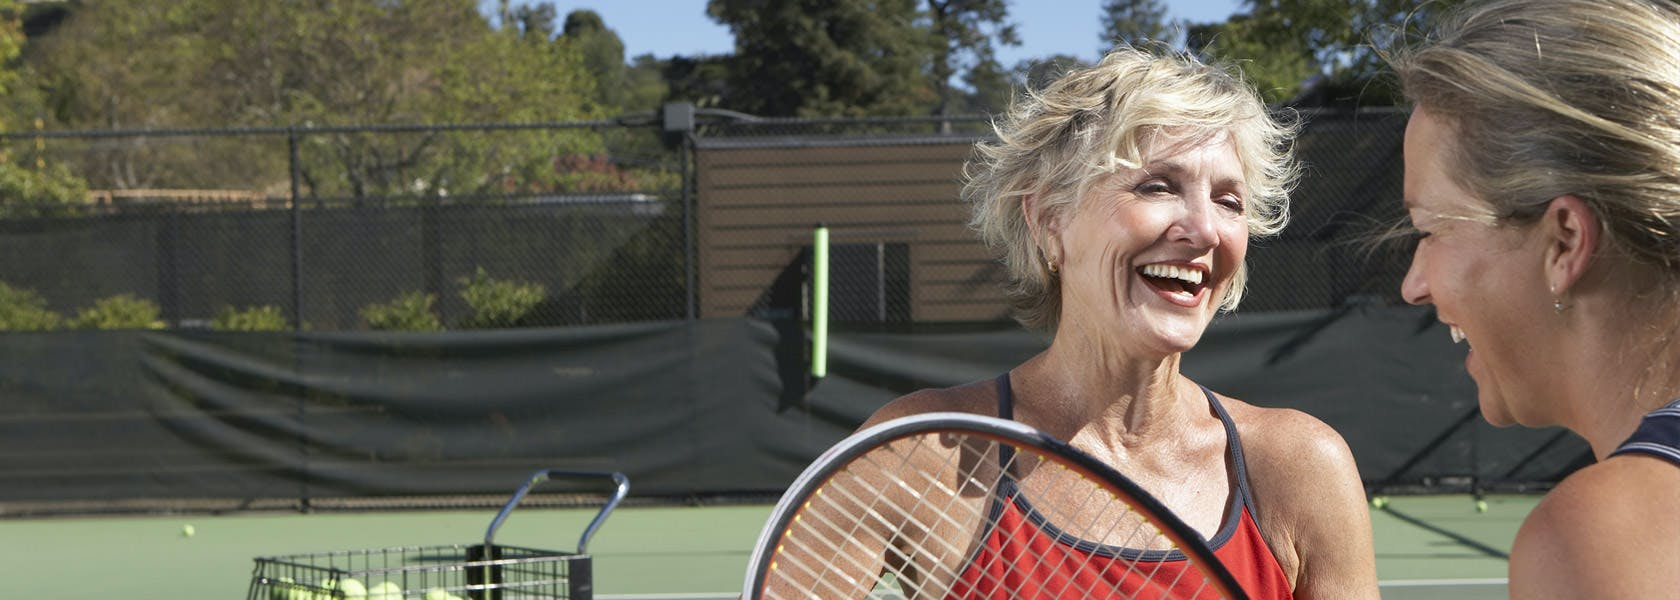 Dos mujeres conversando durante un partido de tennis